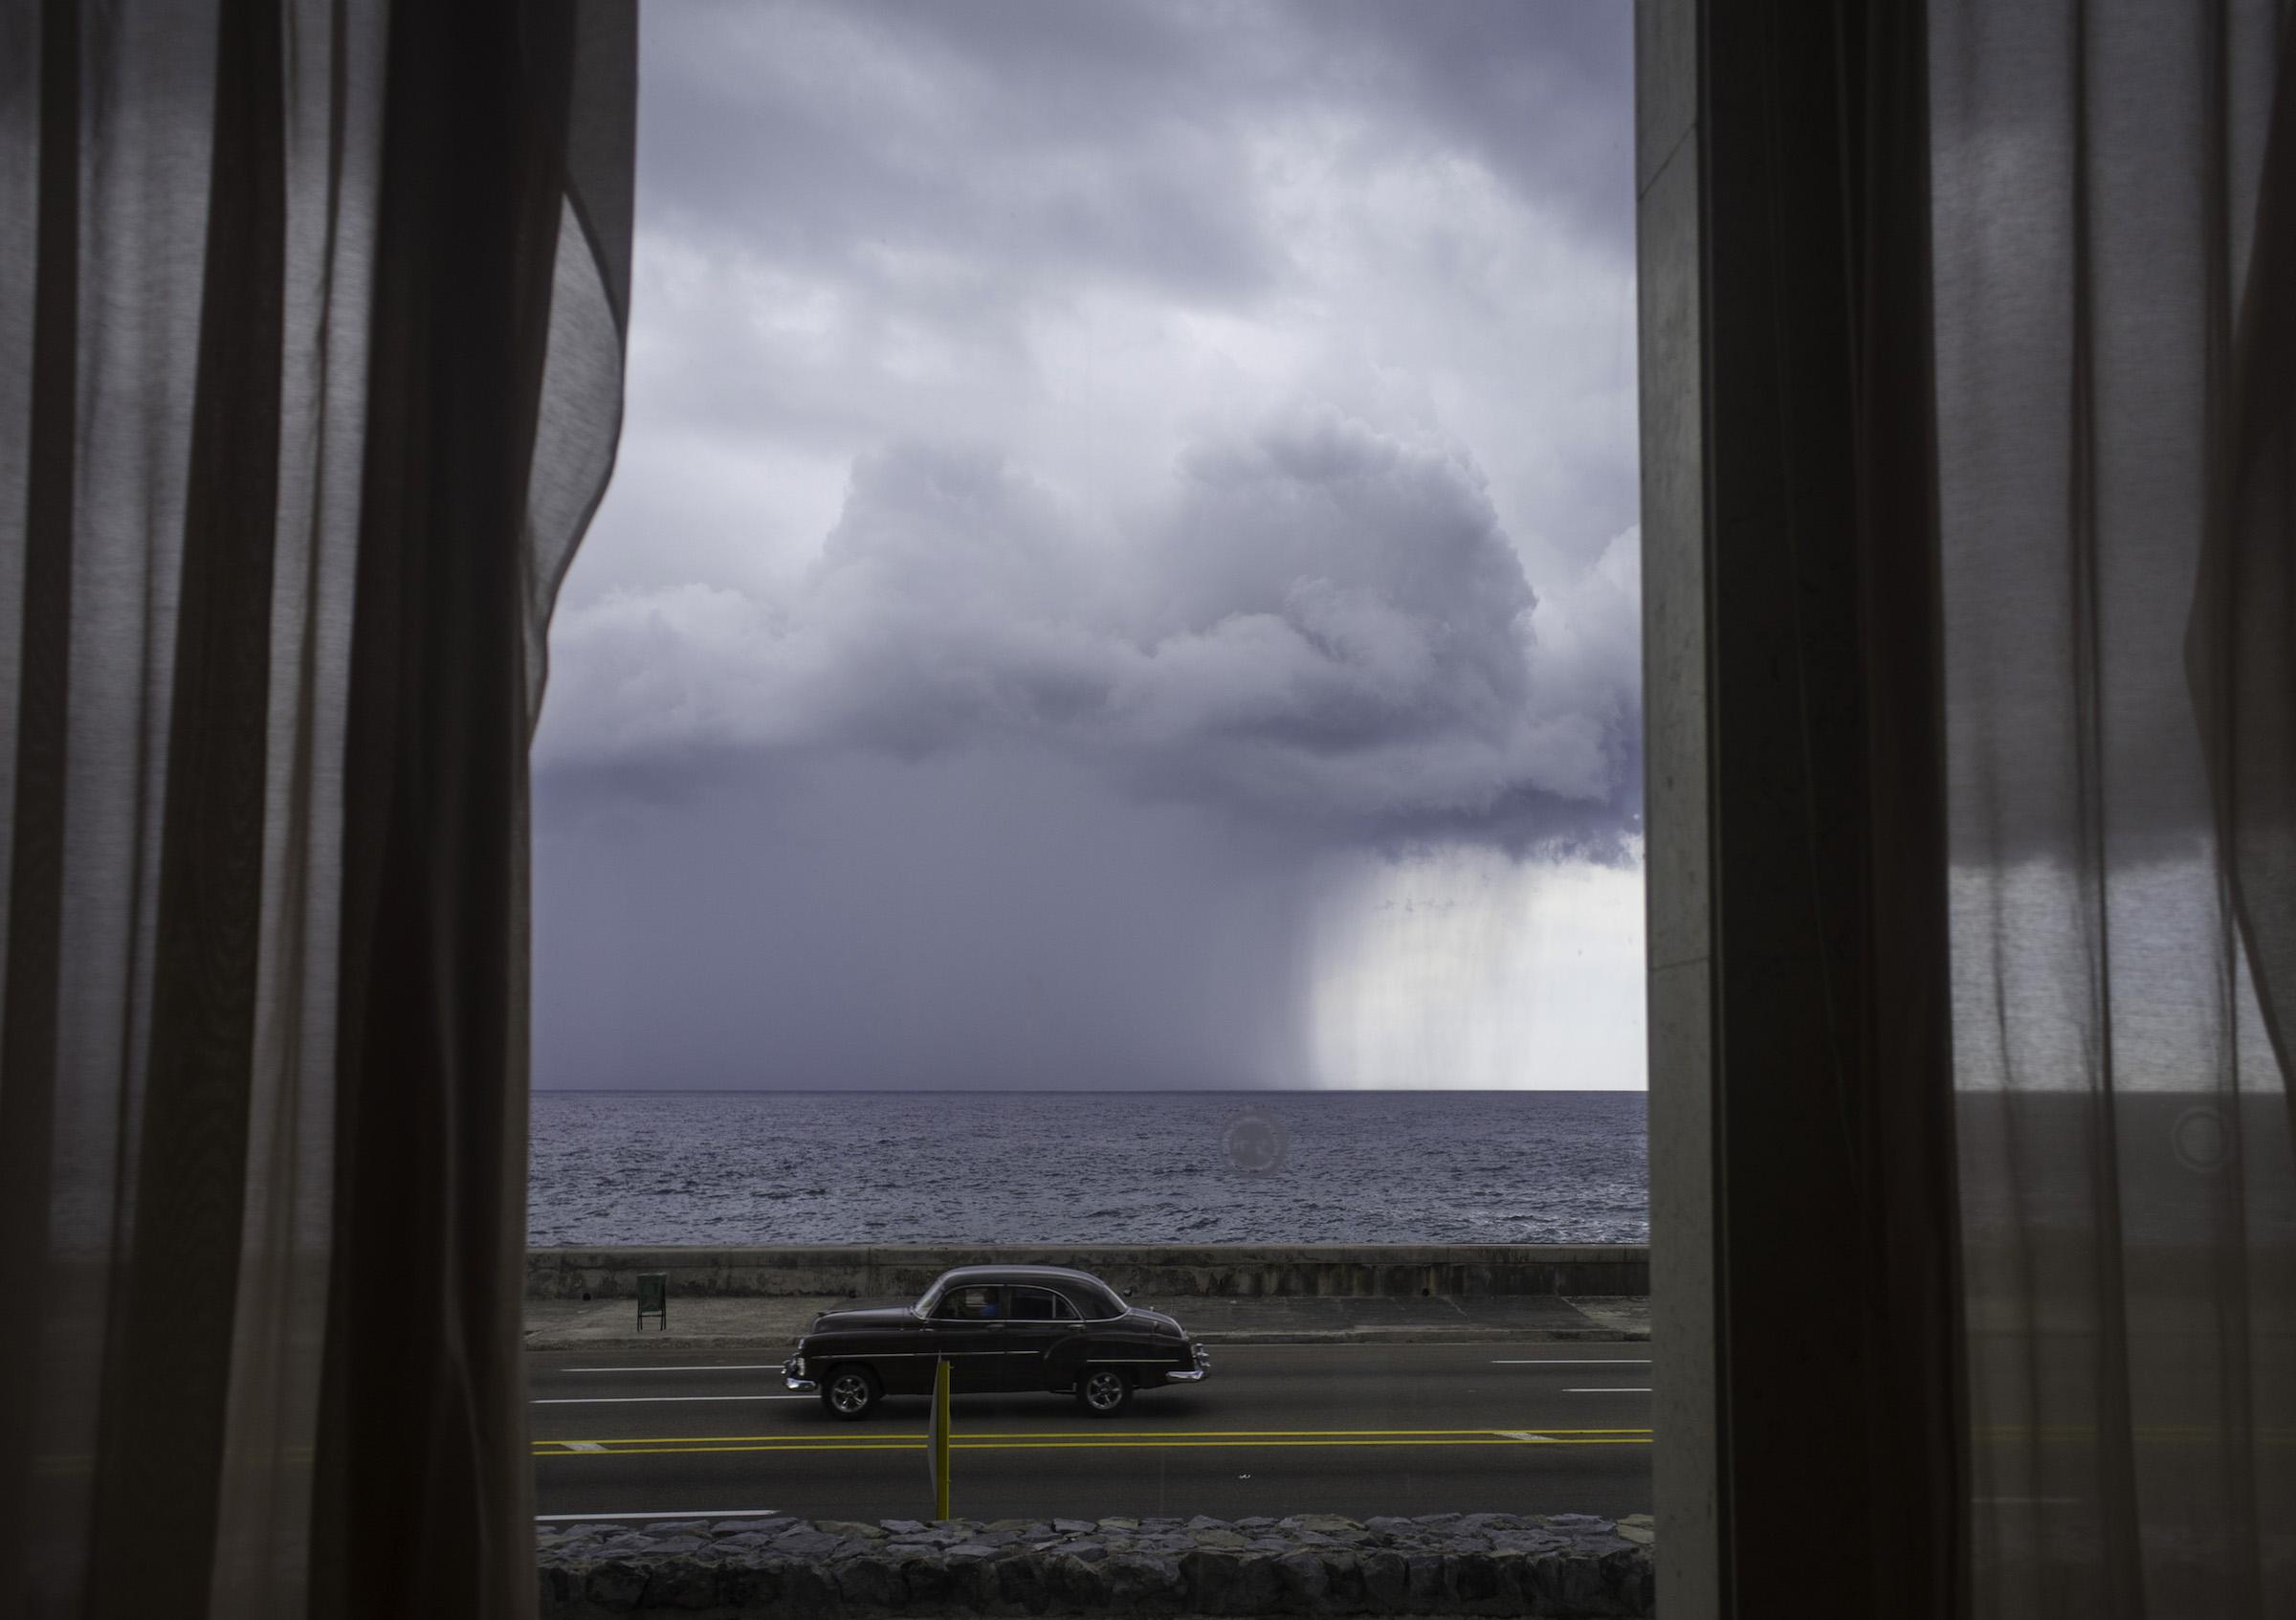 Car Thru curtains Marecon.jpg